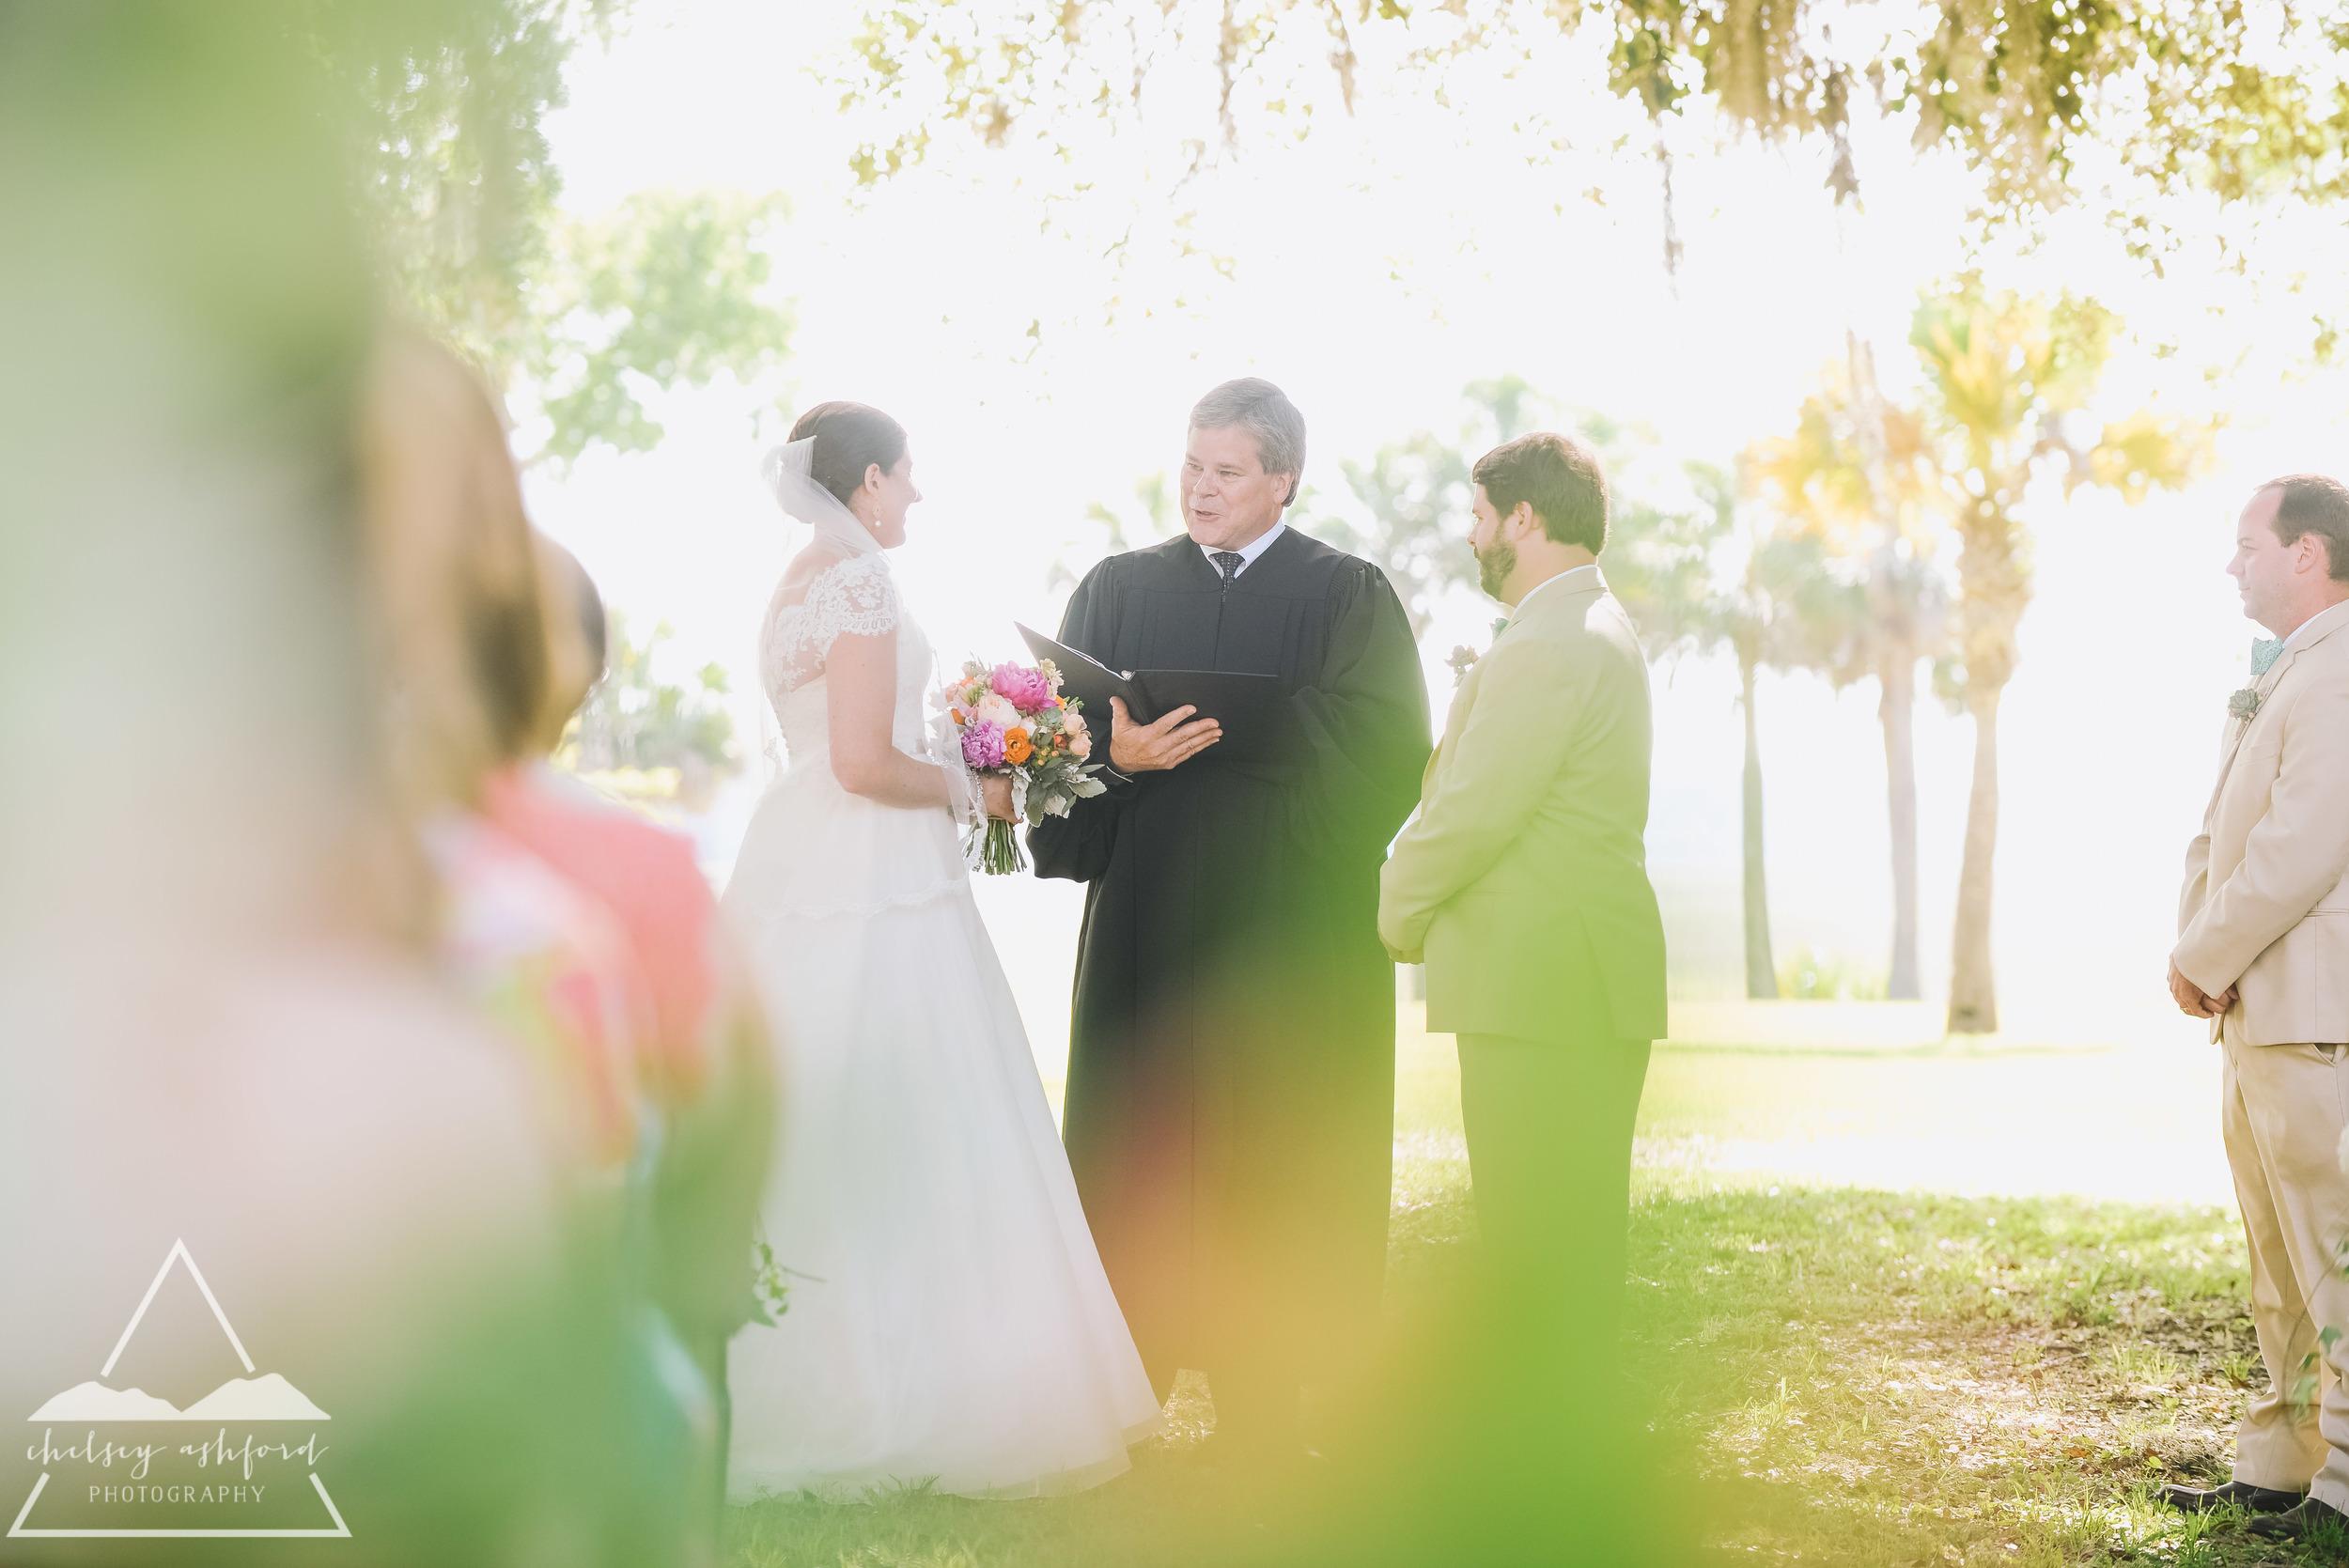 Clarkson_wedding_web-59.jpg